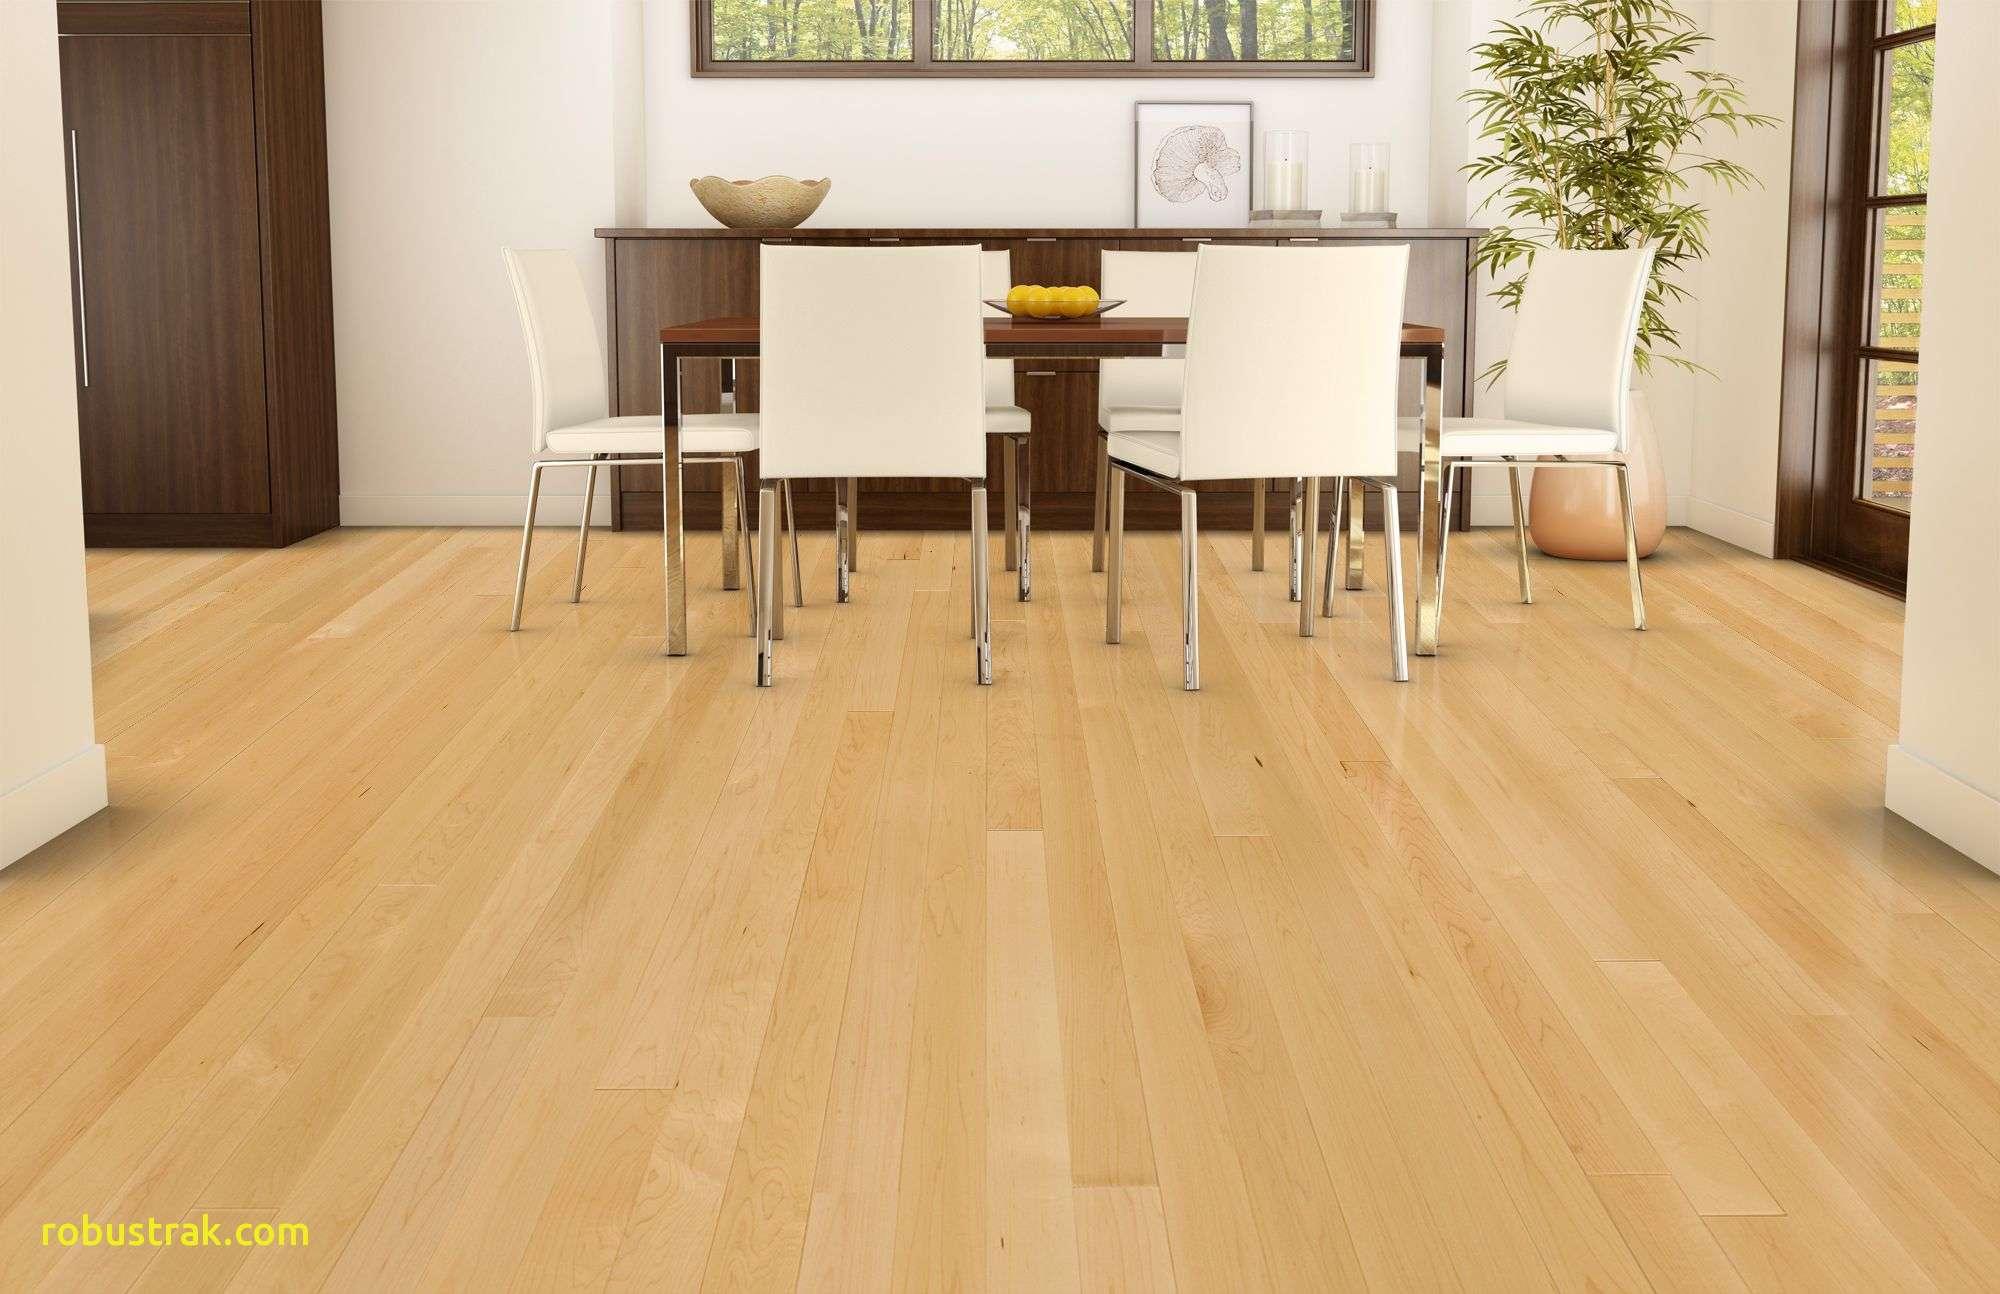 maple hardwood floor maple solid flooring maple solid hardwood flooring at brand floors brand  floors VUNKXTL